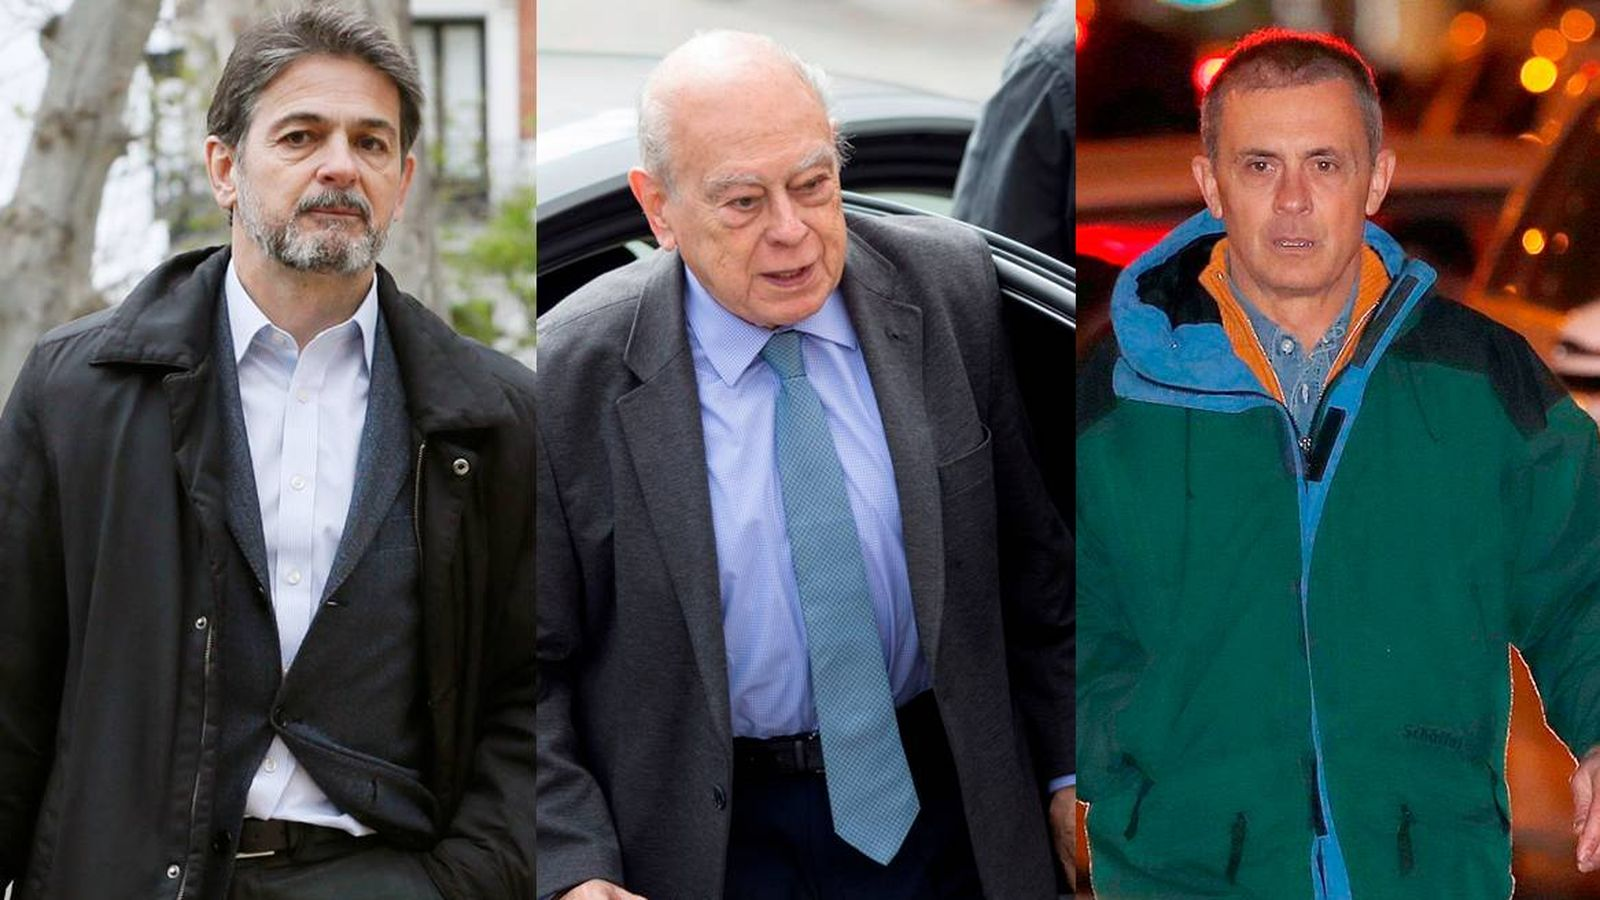 Foto: Oriol Pujol (i), Jordi Pujol (c) y Jordi Pujol Ferrusola. (EFE)